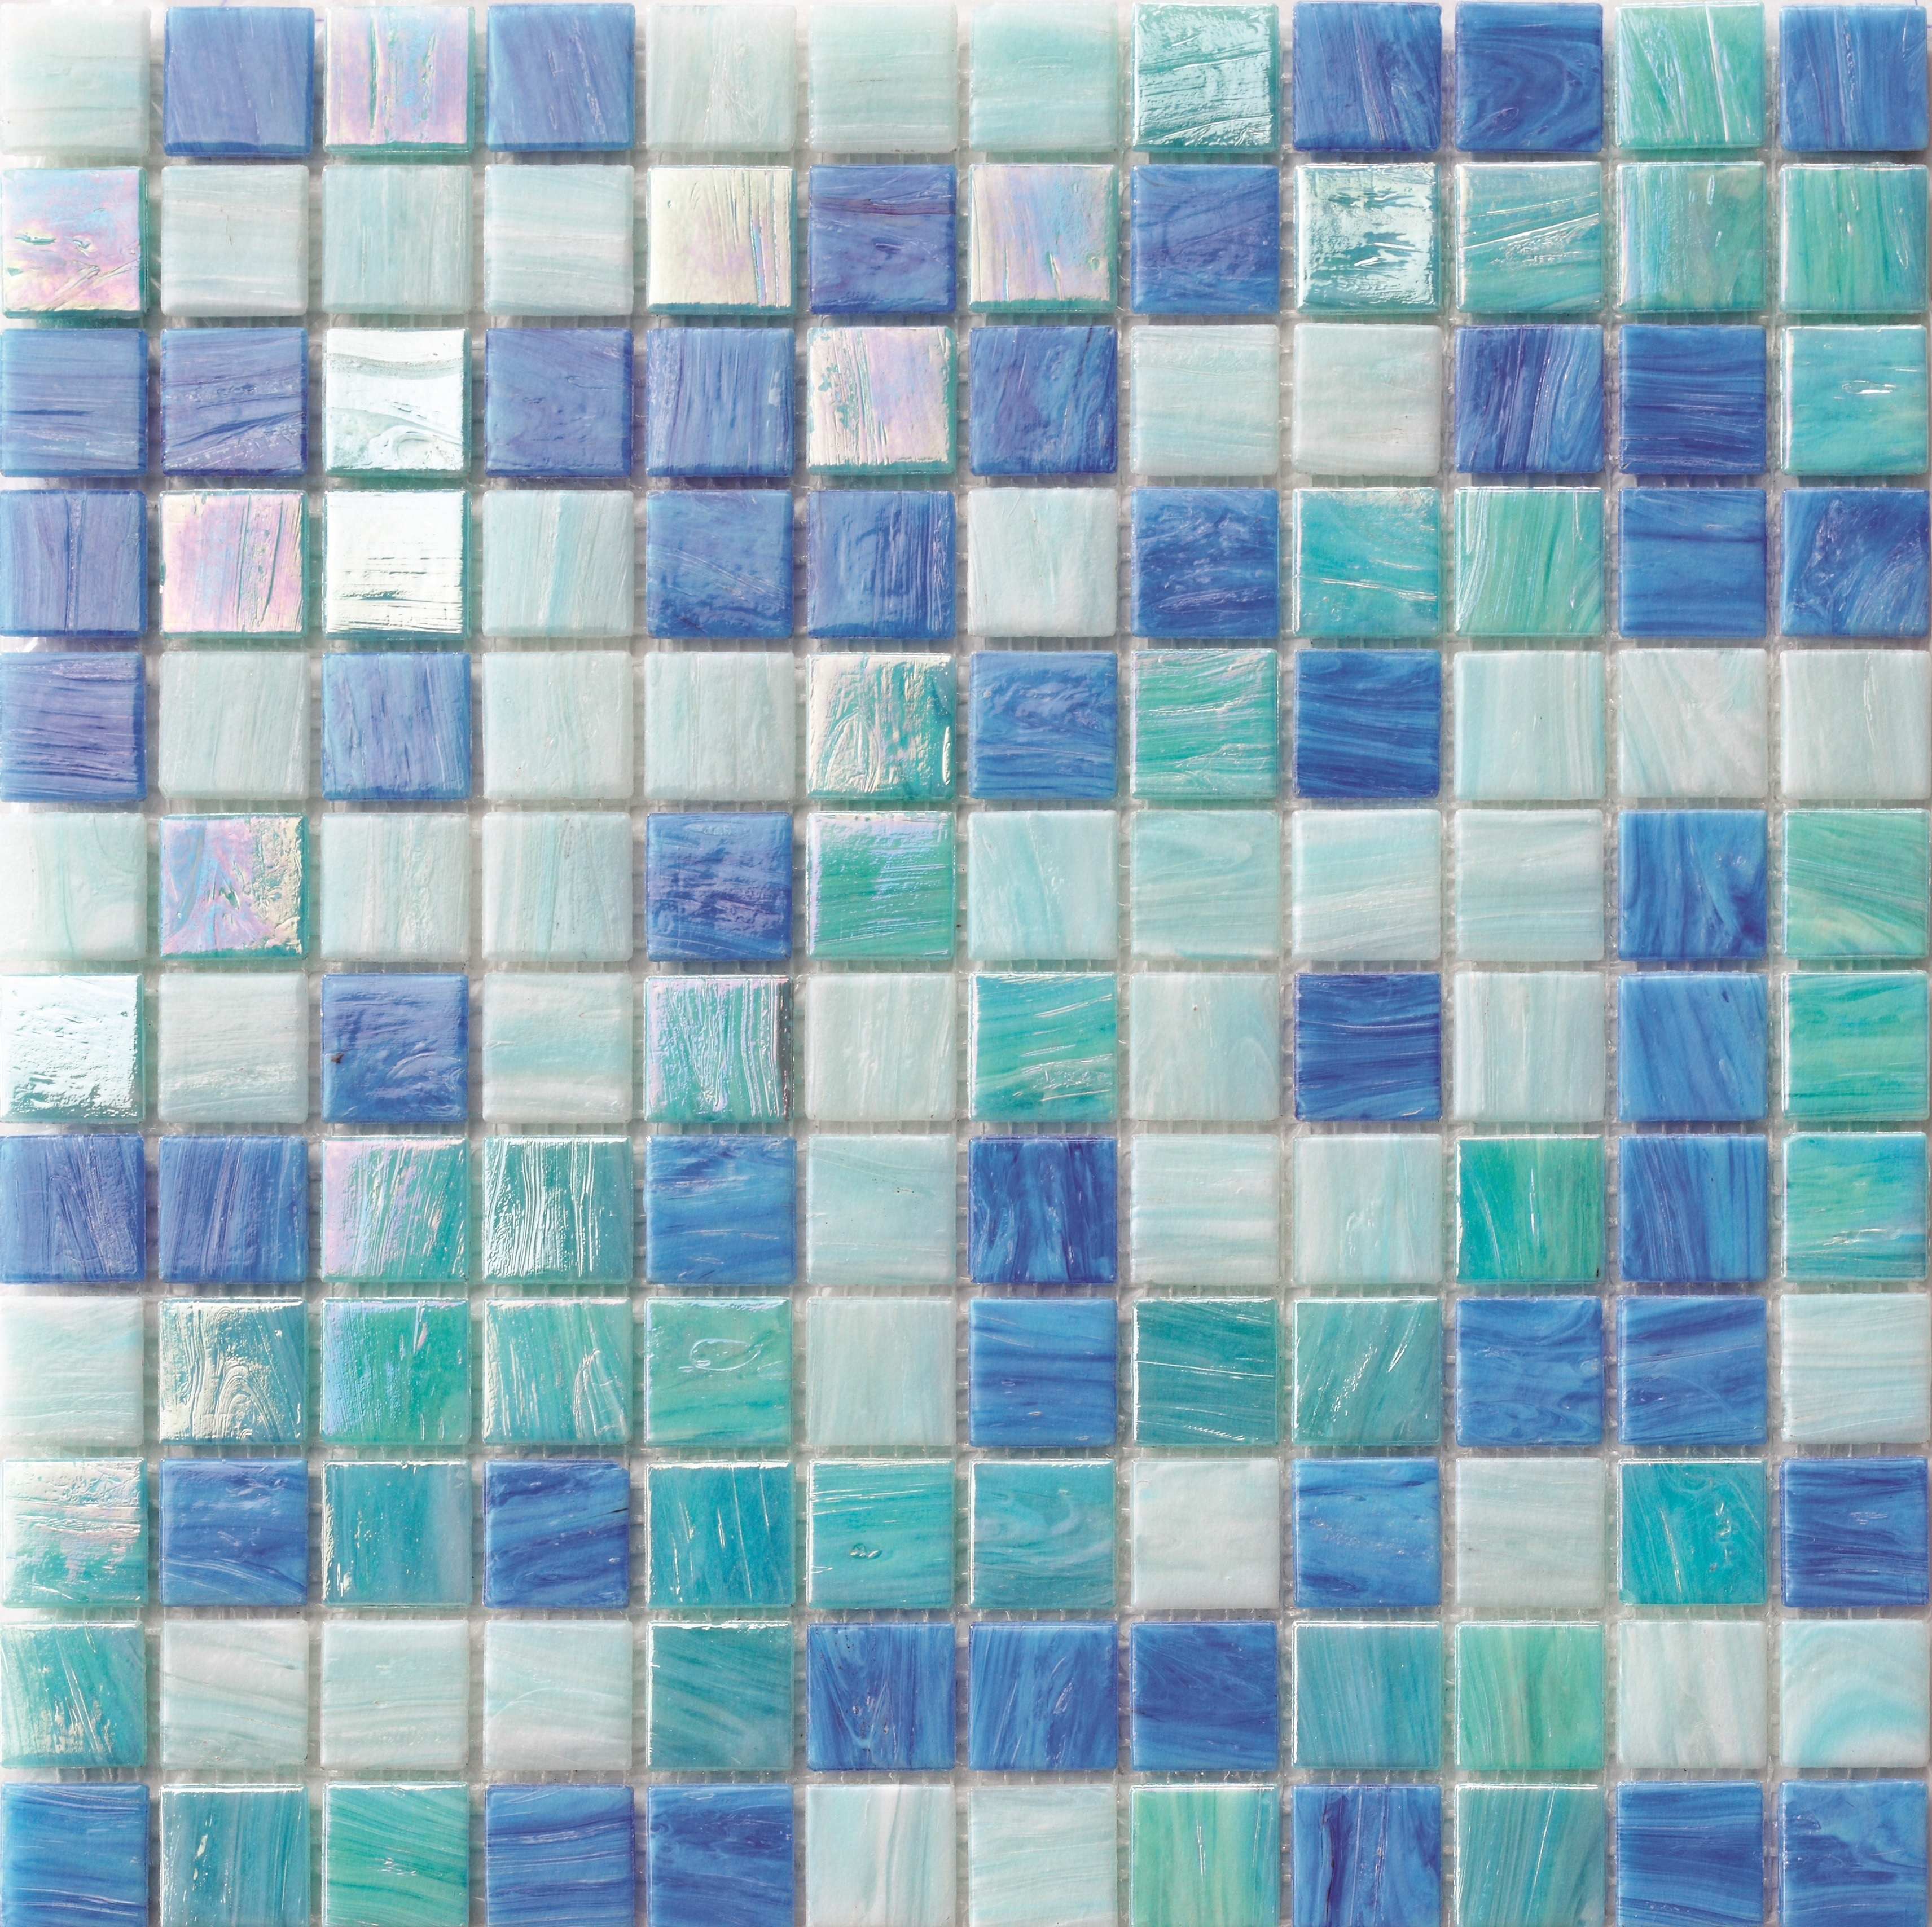 1X1 CASCADE BLUE BLEND 1x1 - POOL TILE 0